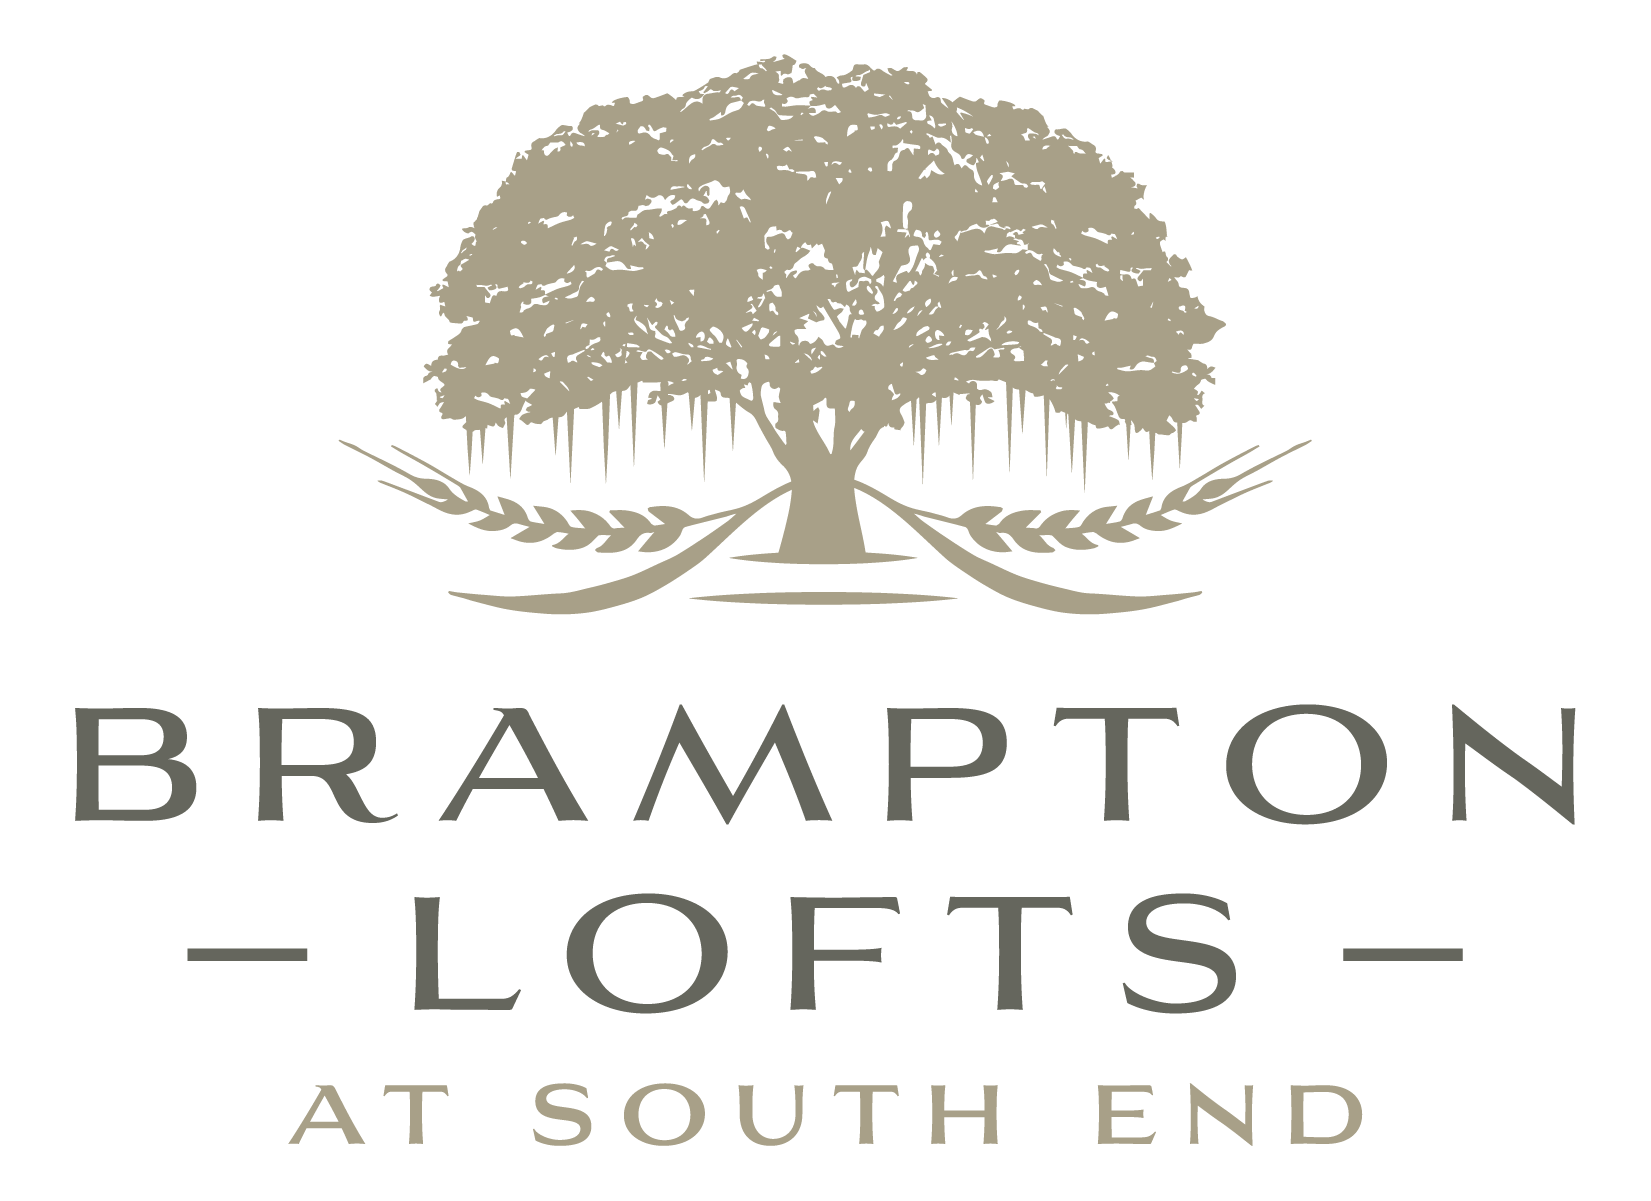 Brampton Lofts Brunswick, GA | Apartments and Lofts